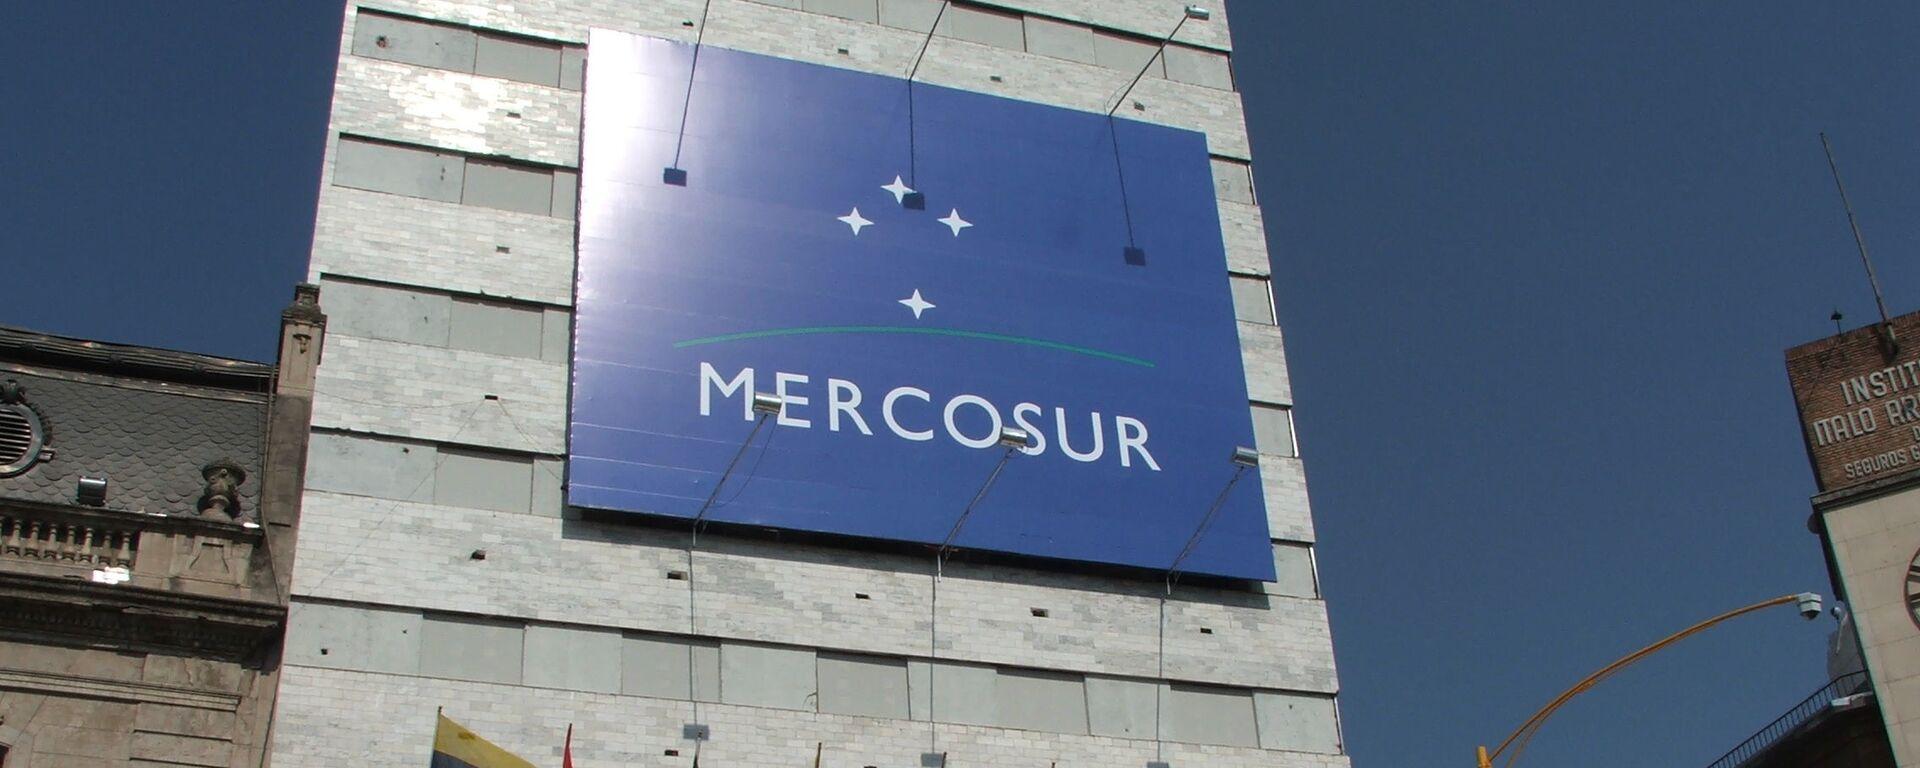 Sede de Mercosur - Sputnik Mundo, 1920, 15.12.2020